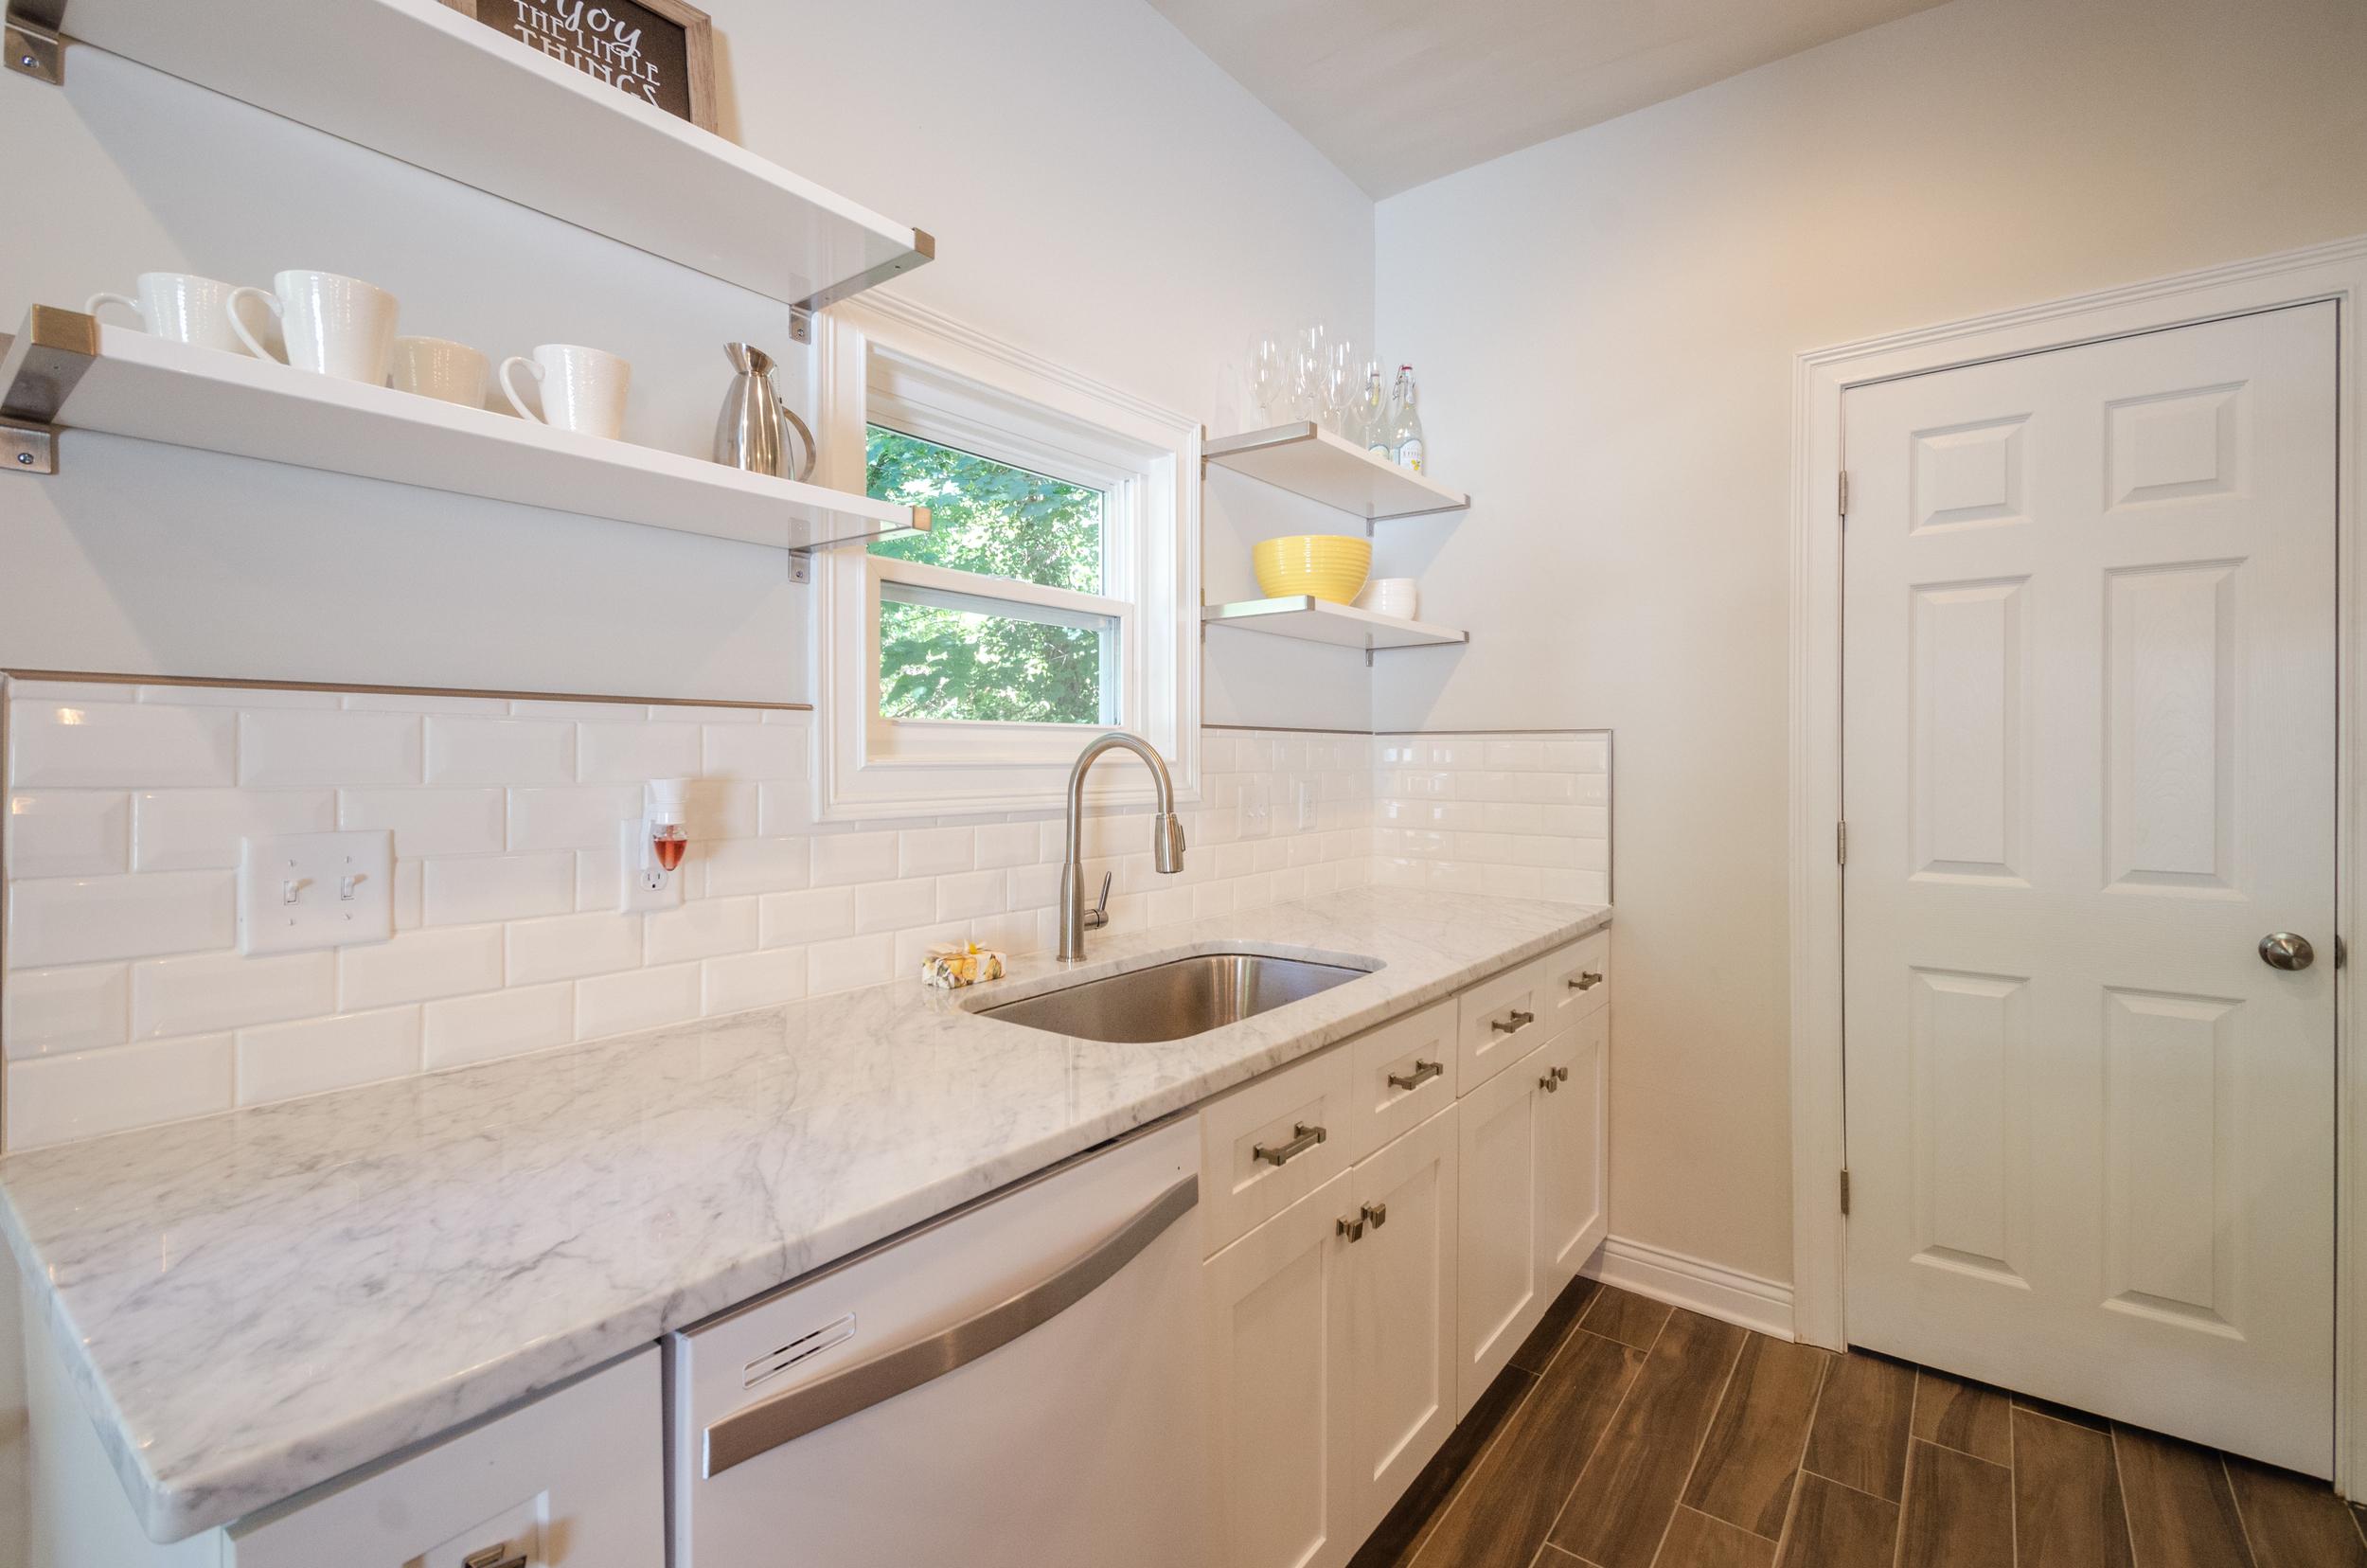 White Shaker Cabinet Kitchen with Carrara Marble Counters and beveled subway tile backsplash